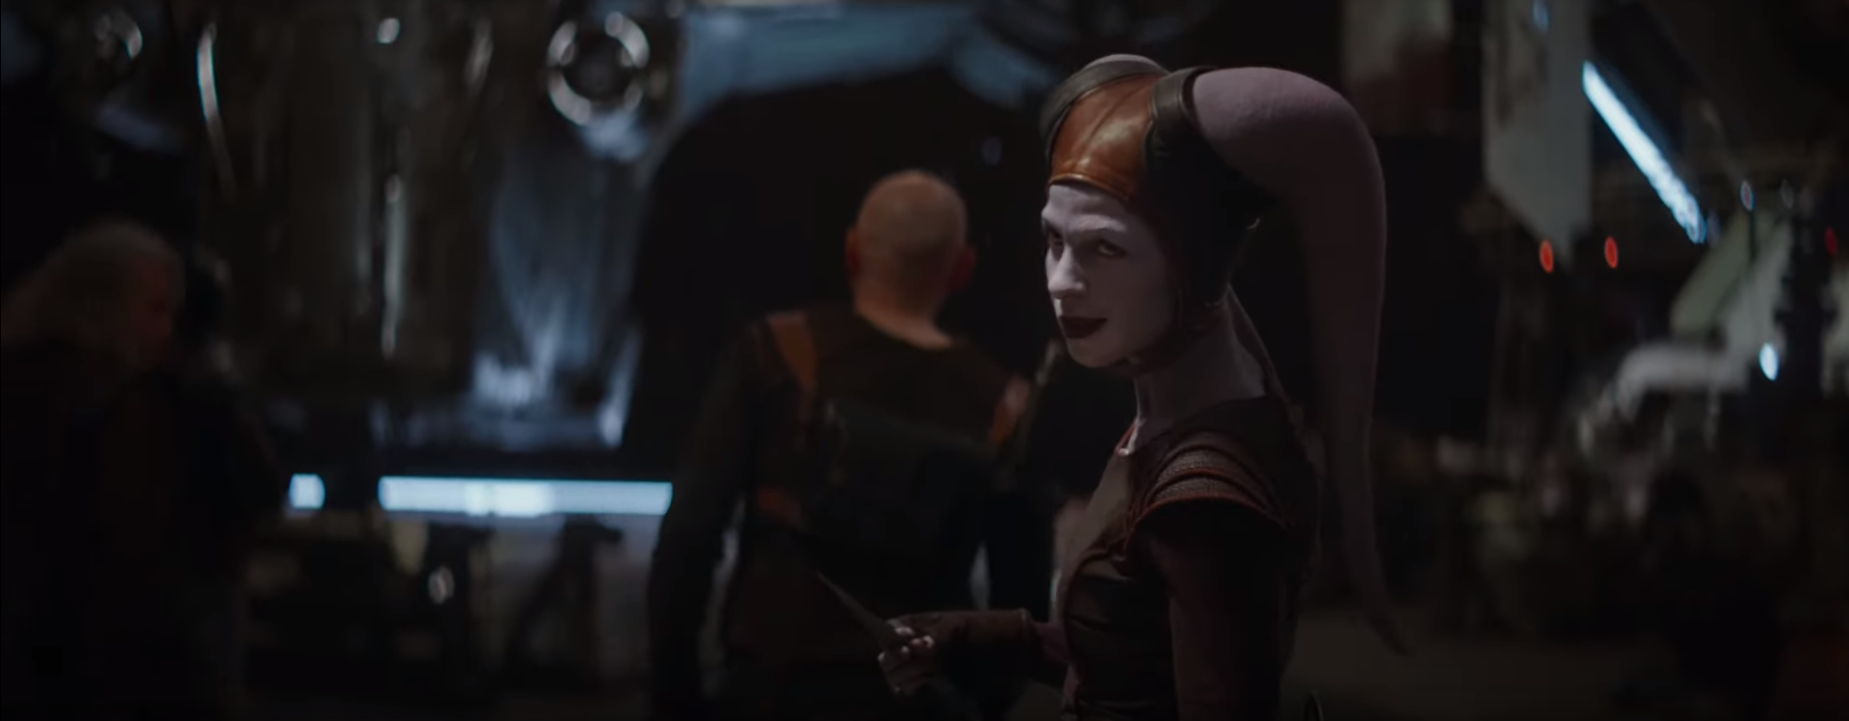 Star wars the mandalorian trailer